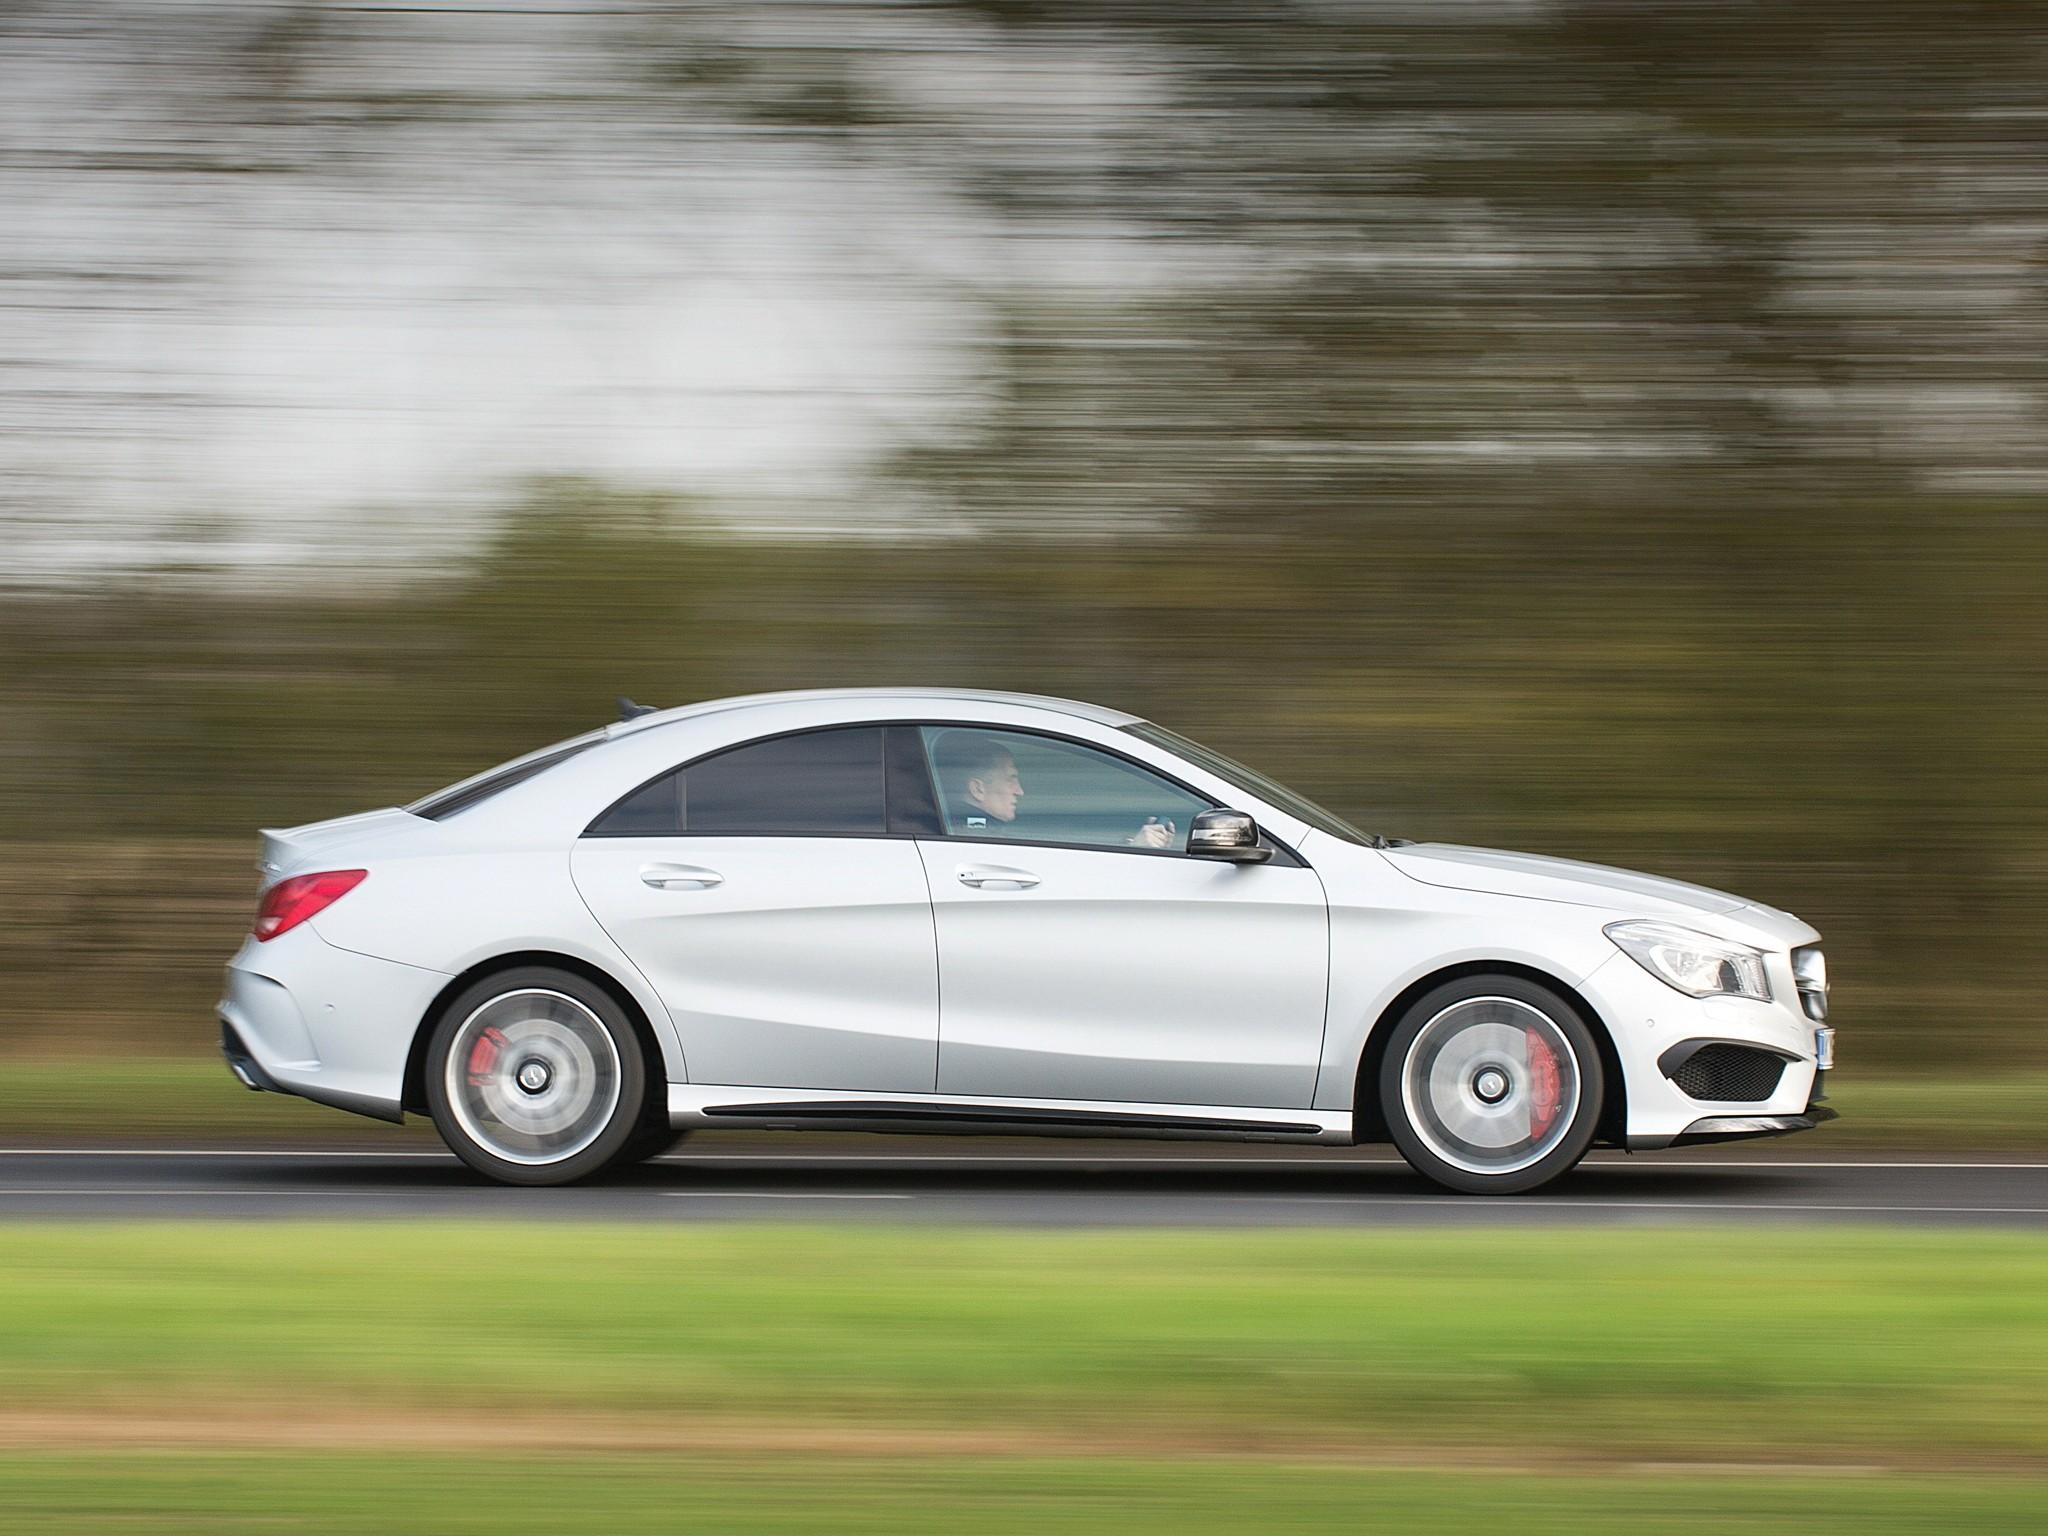 Mercedes benz cla 45 c117 specs 2013 2014 2015 2016 for 2013 cla mercedes benz